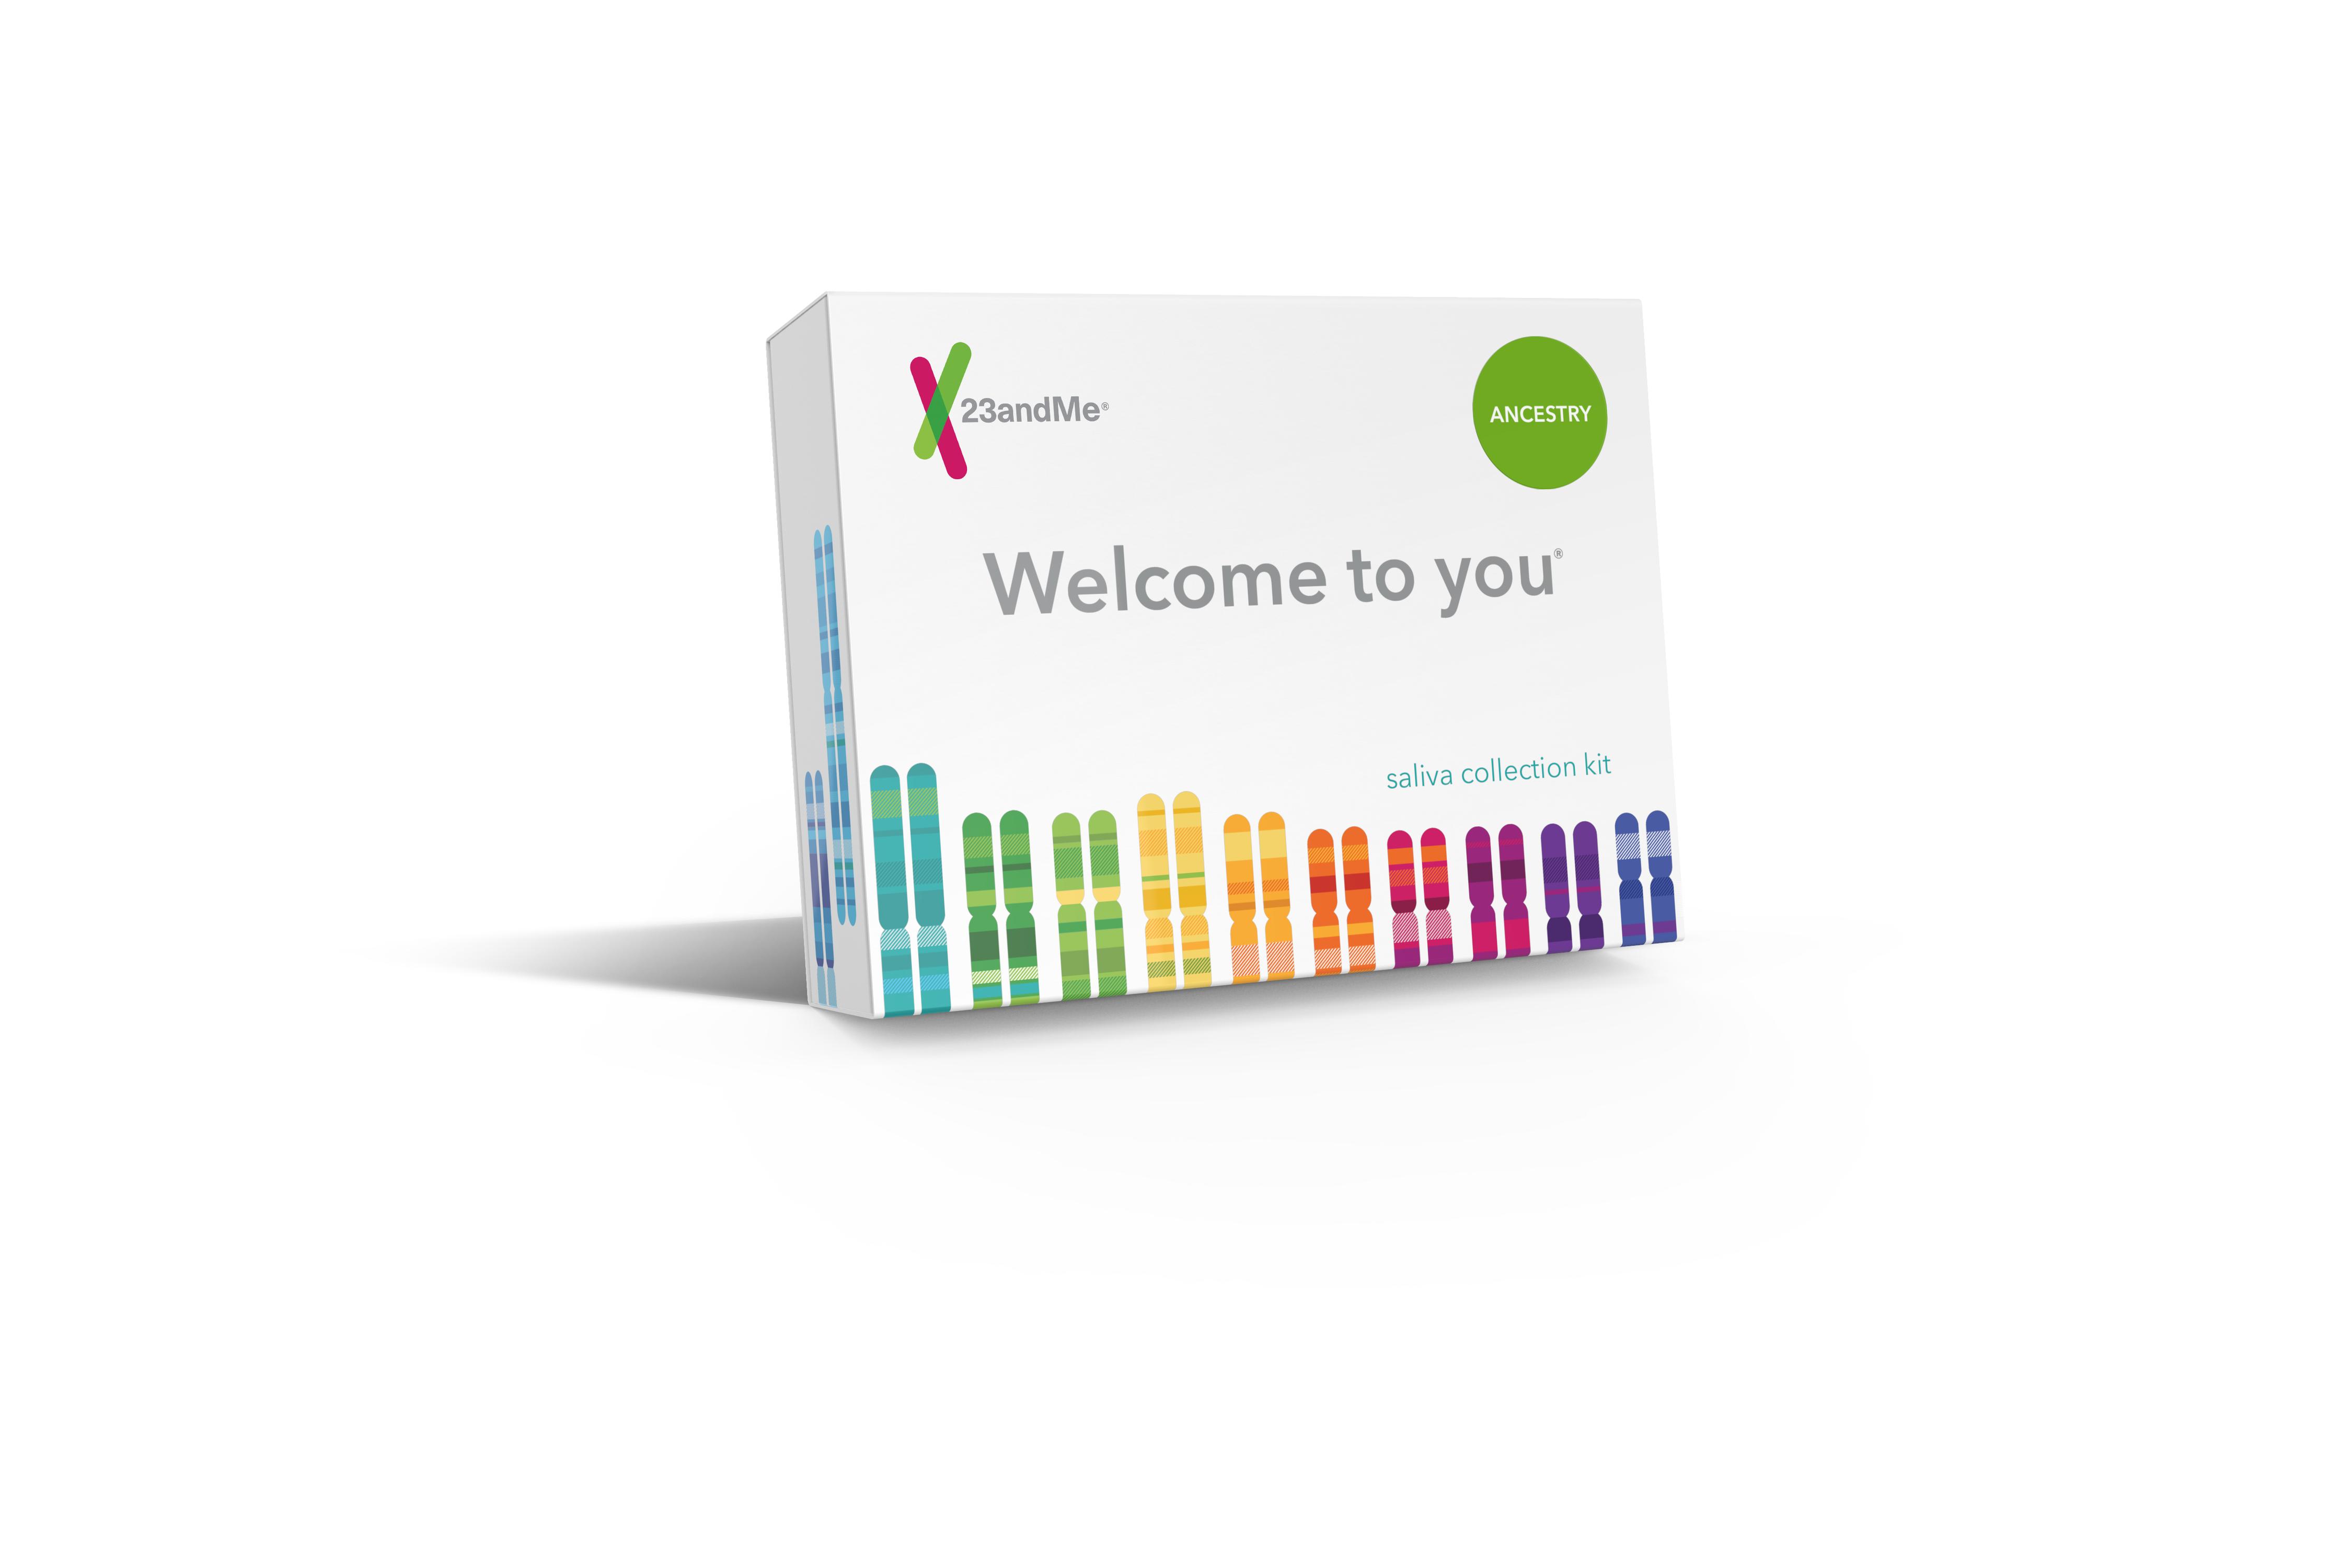 cancer genetic kit)